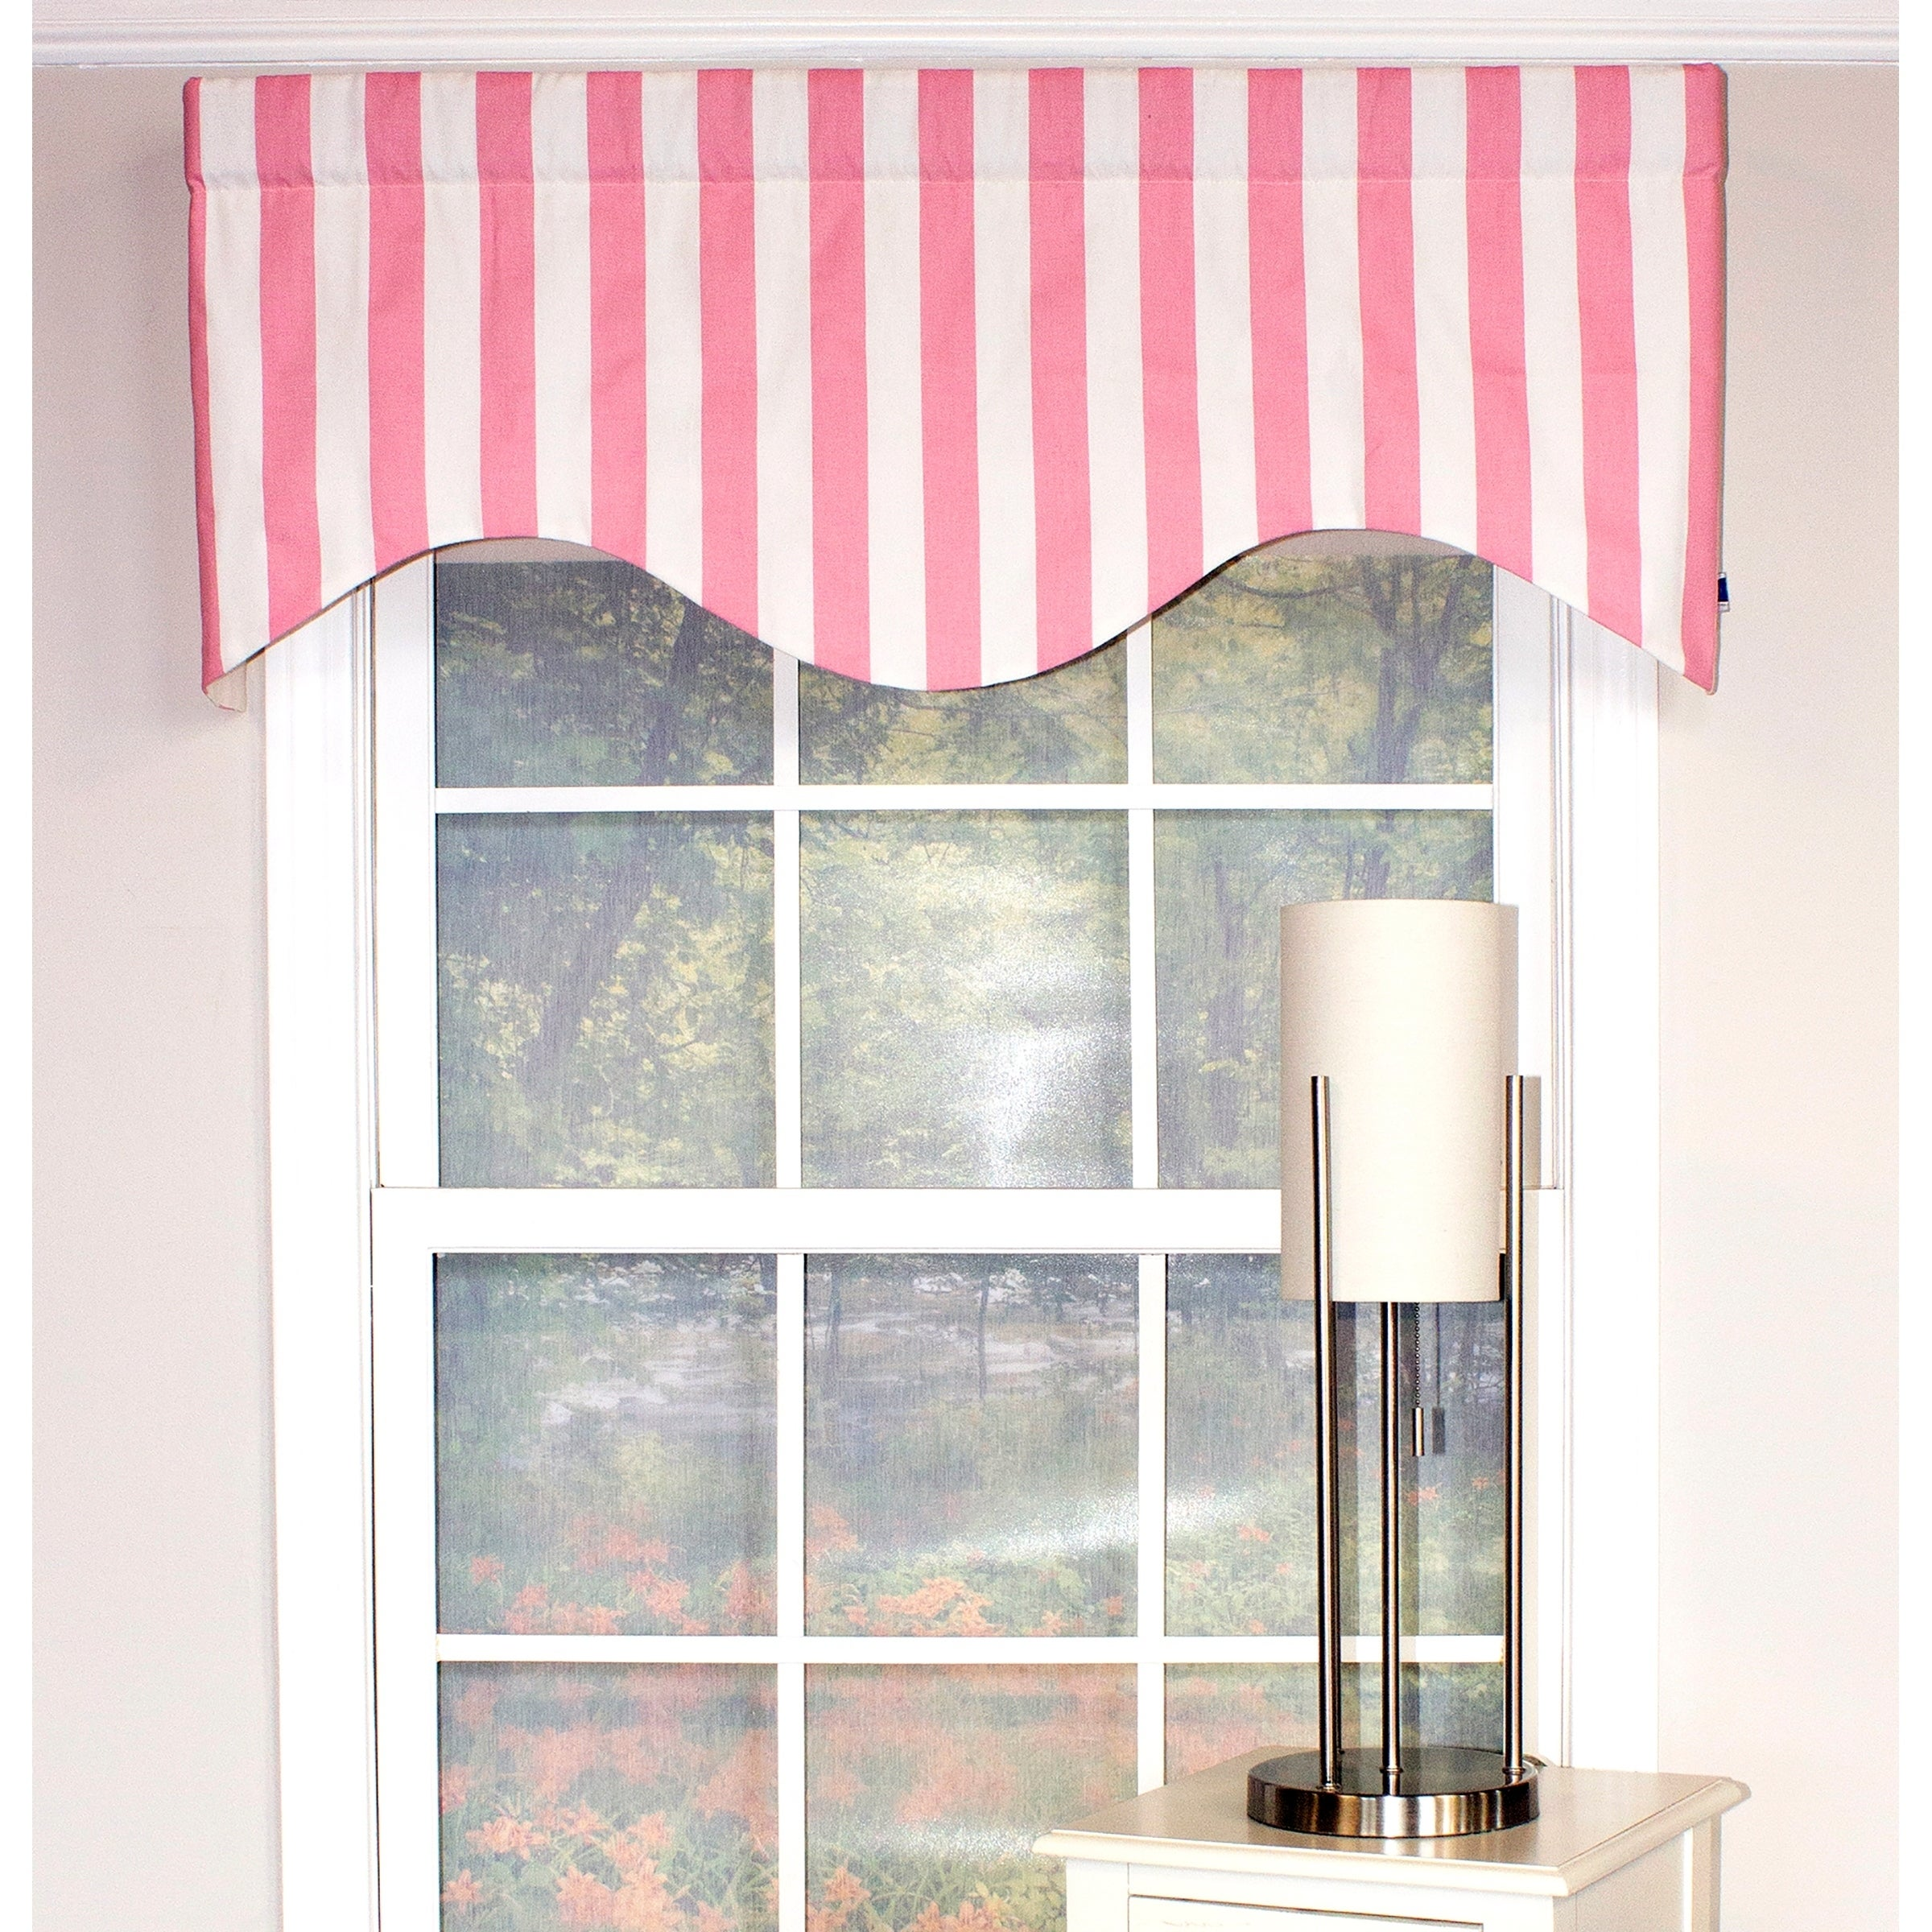 Canopy Stripe Cornice Window Valance